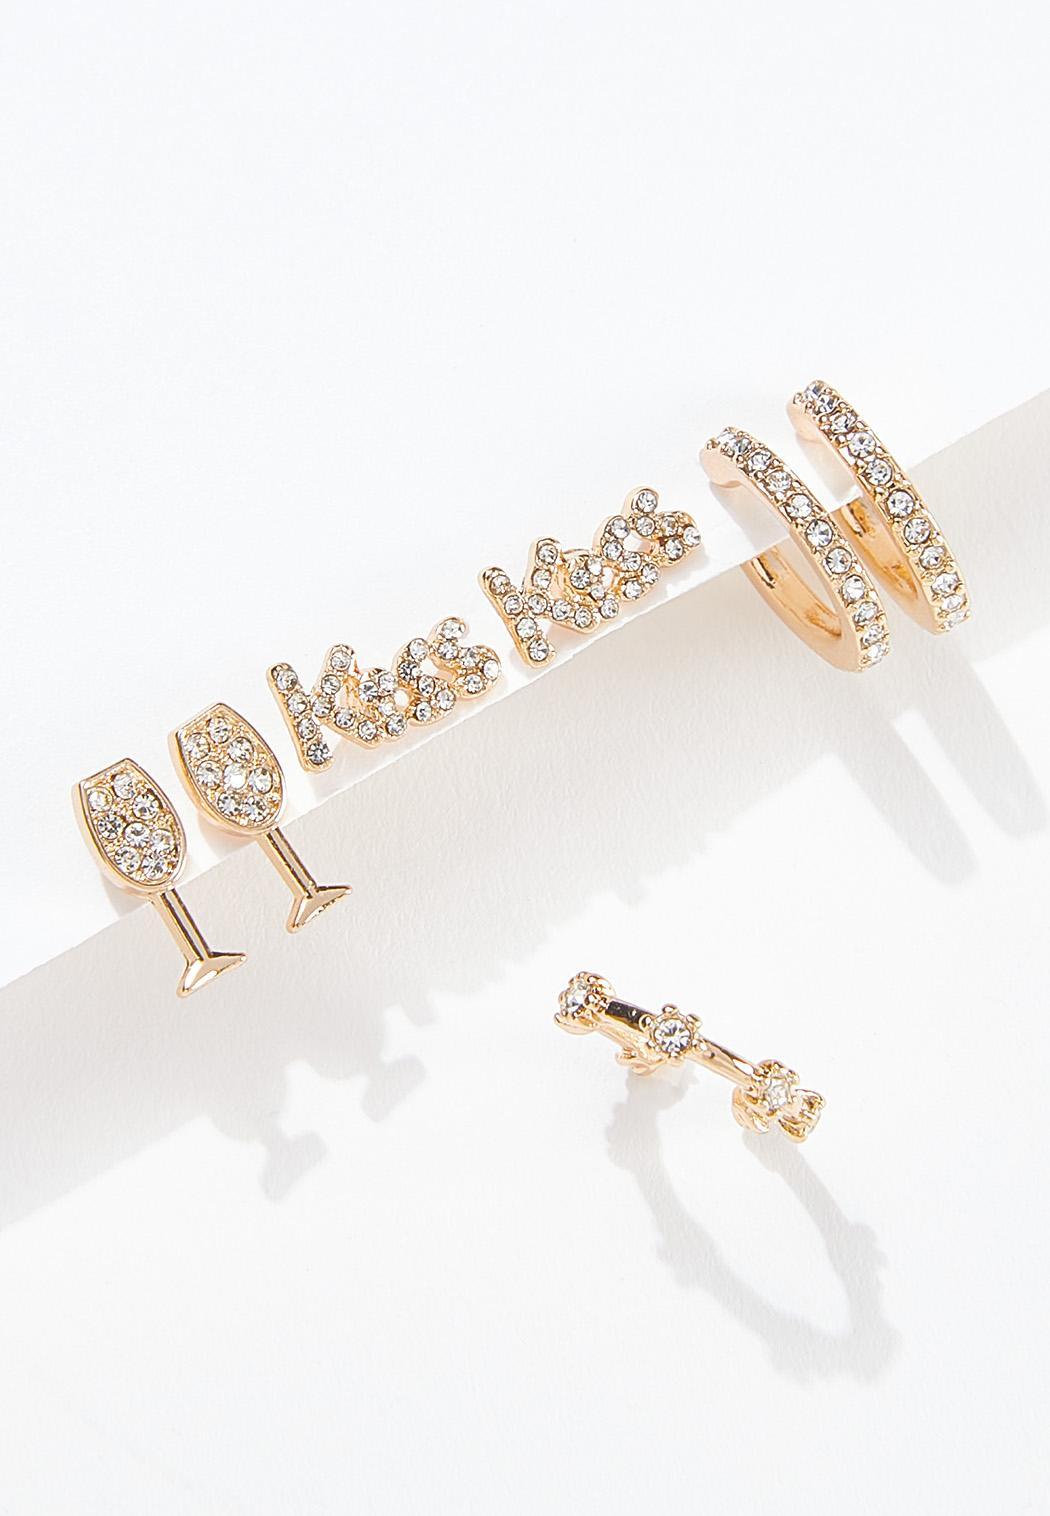 Date Night Stone Earring Set